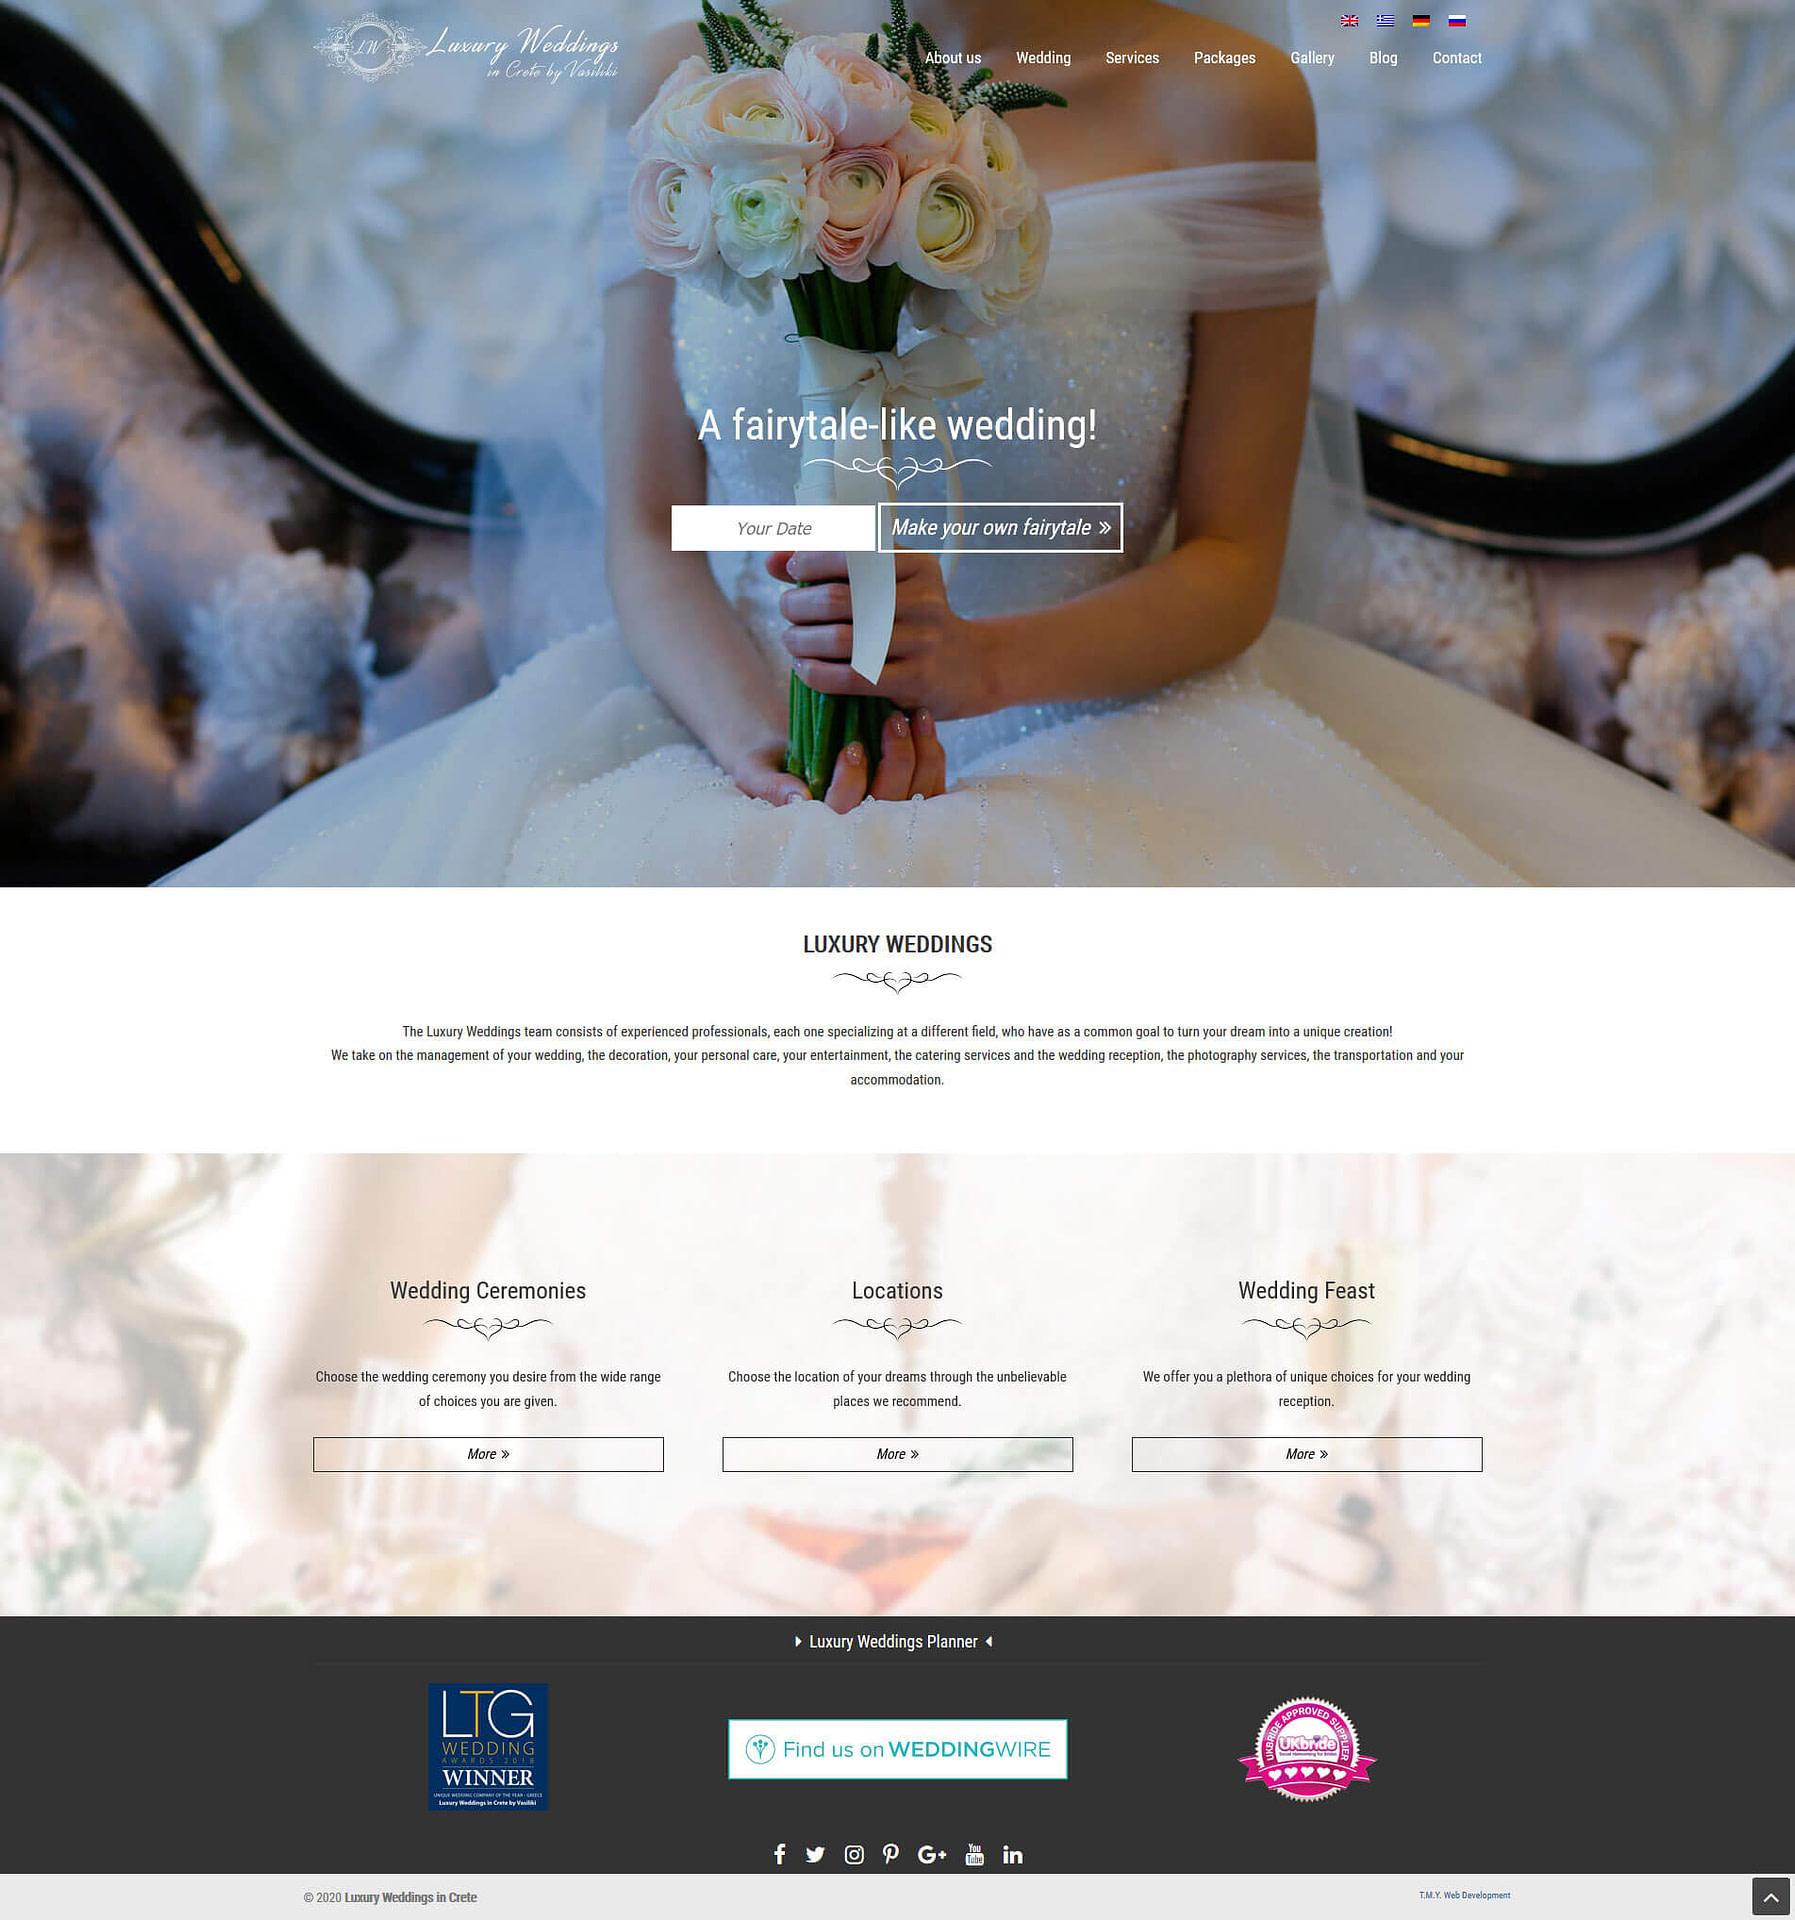 Luxury Weddings - TMY WEB Development